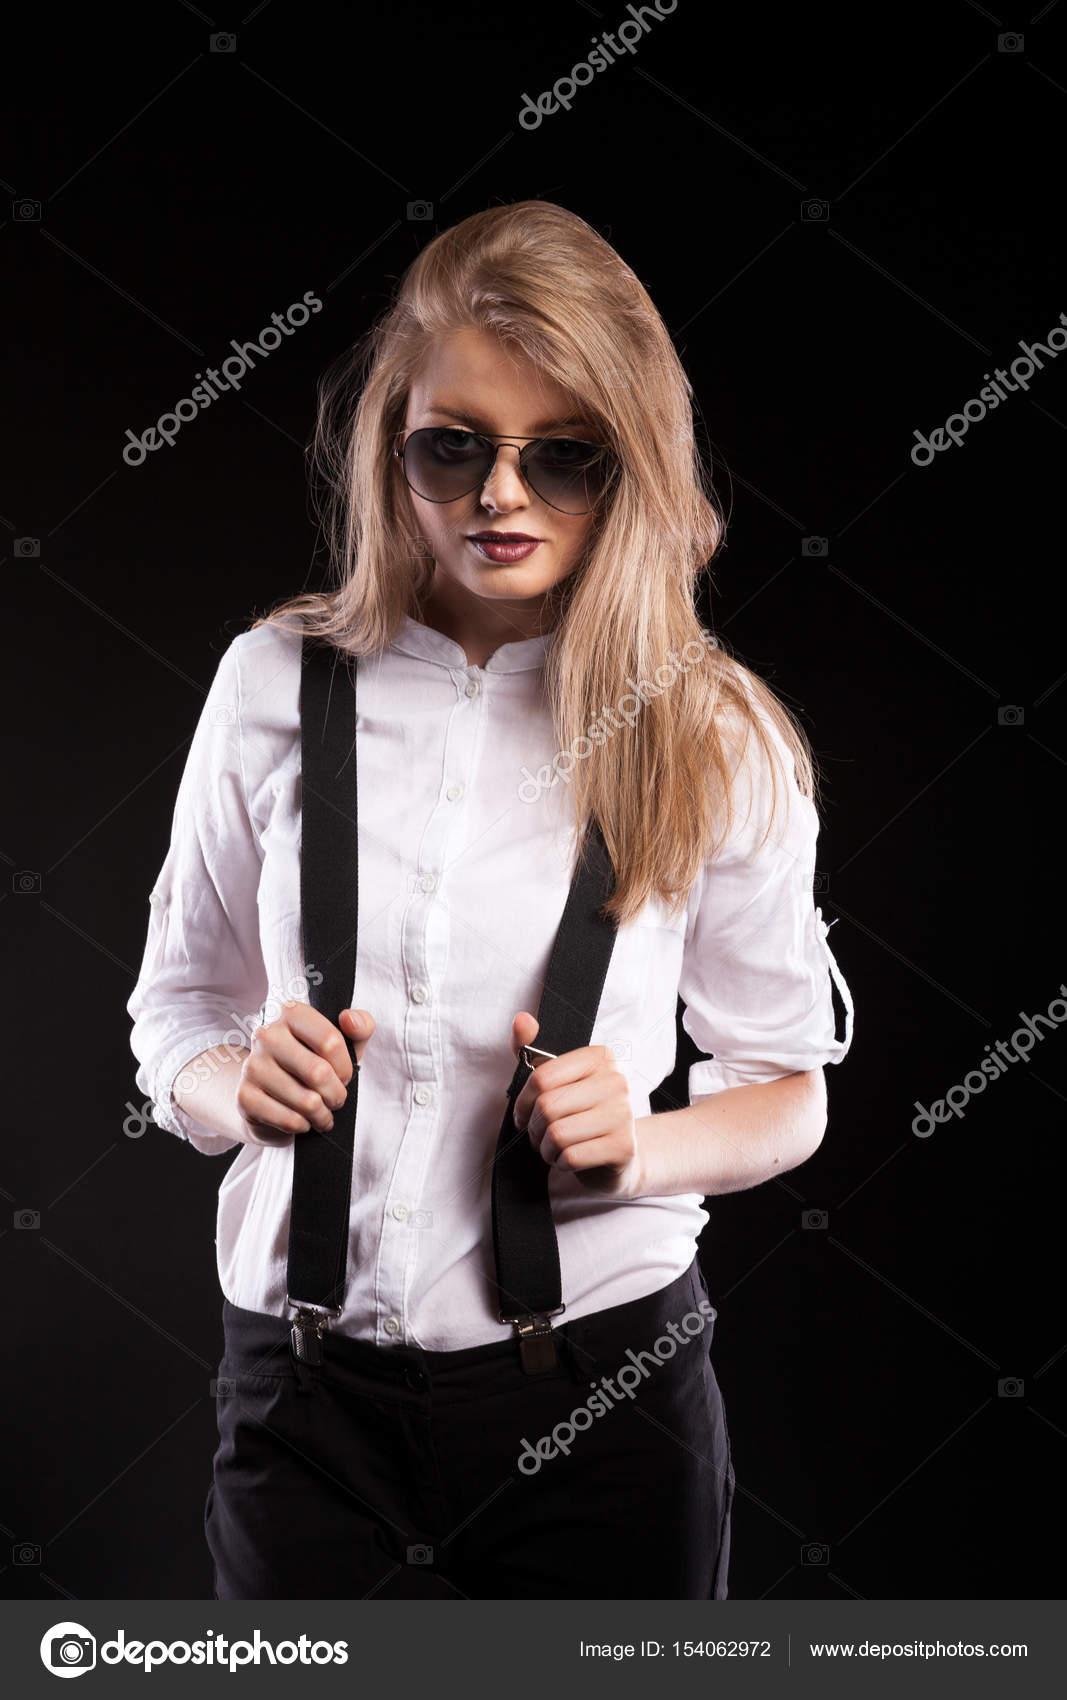 blondinki-v-podtyazhkah-foto-mokrie-kiski-galereya